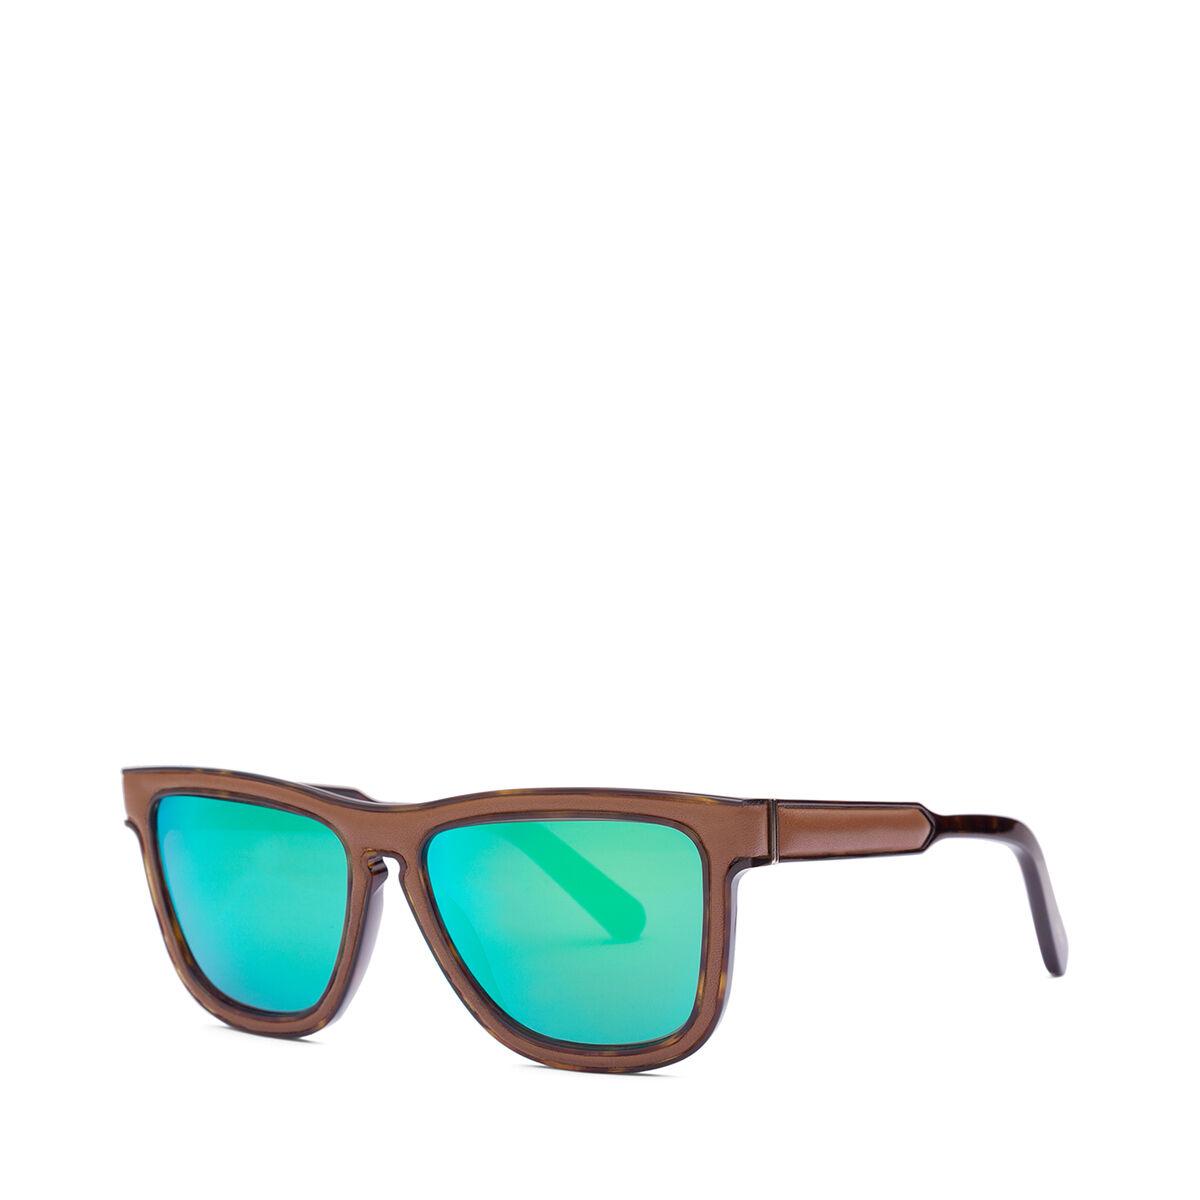 LOEWE Gafas Cuadradas Acolchadas Marron/Verde Espejo all